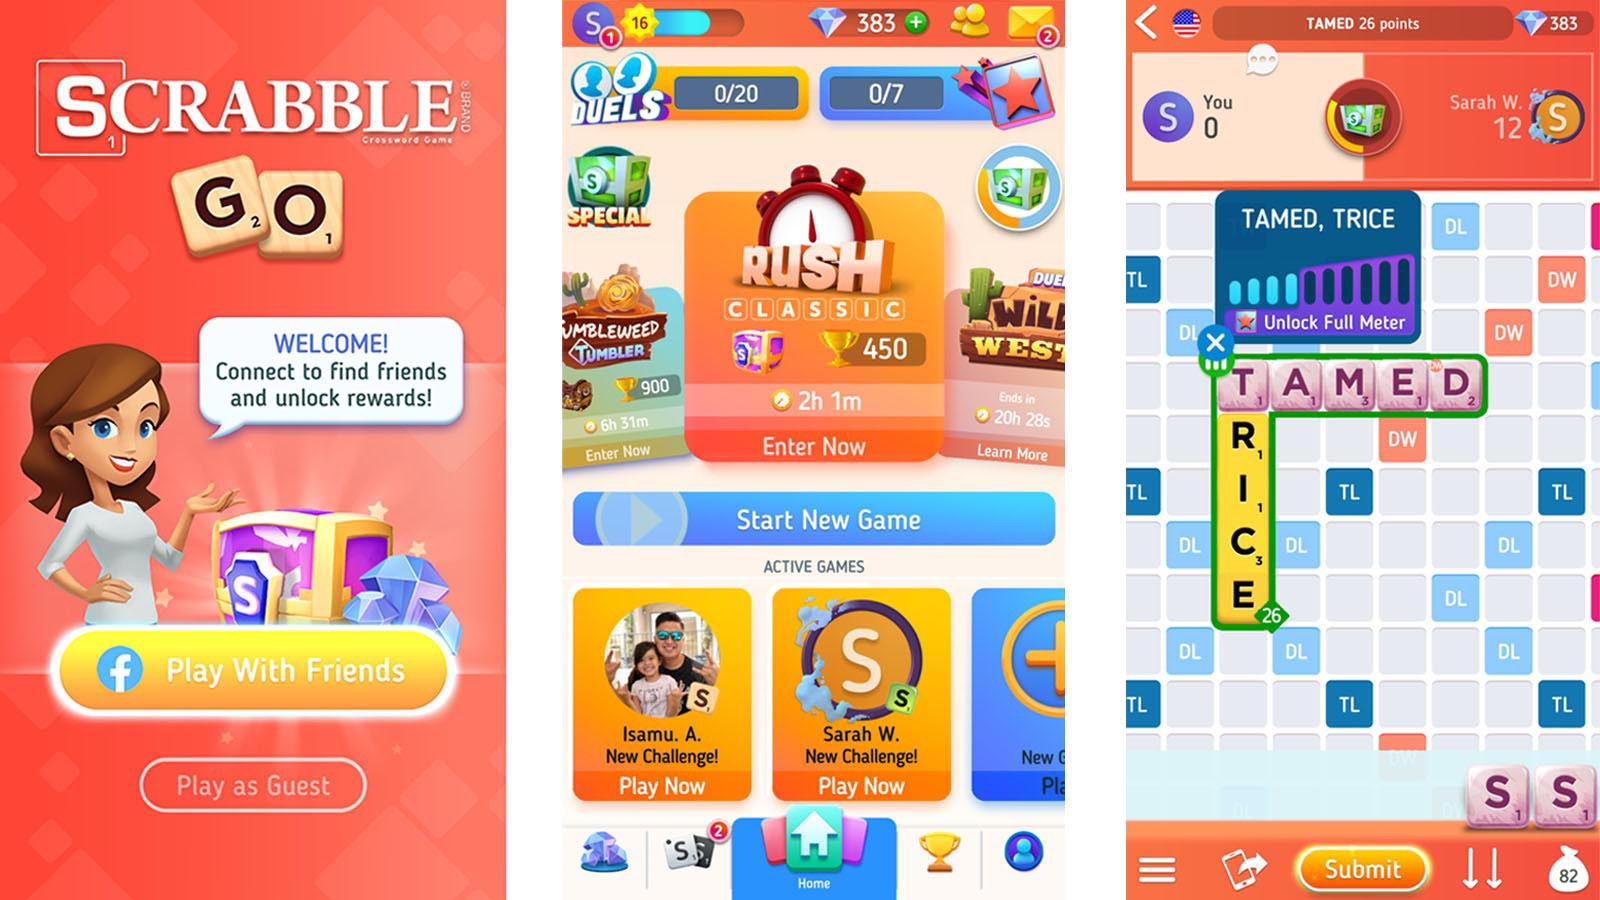 Scrabble Go game screenshots